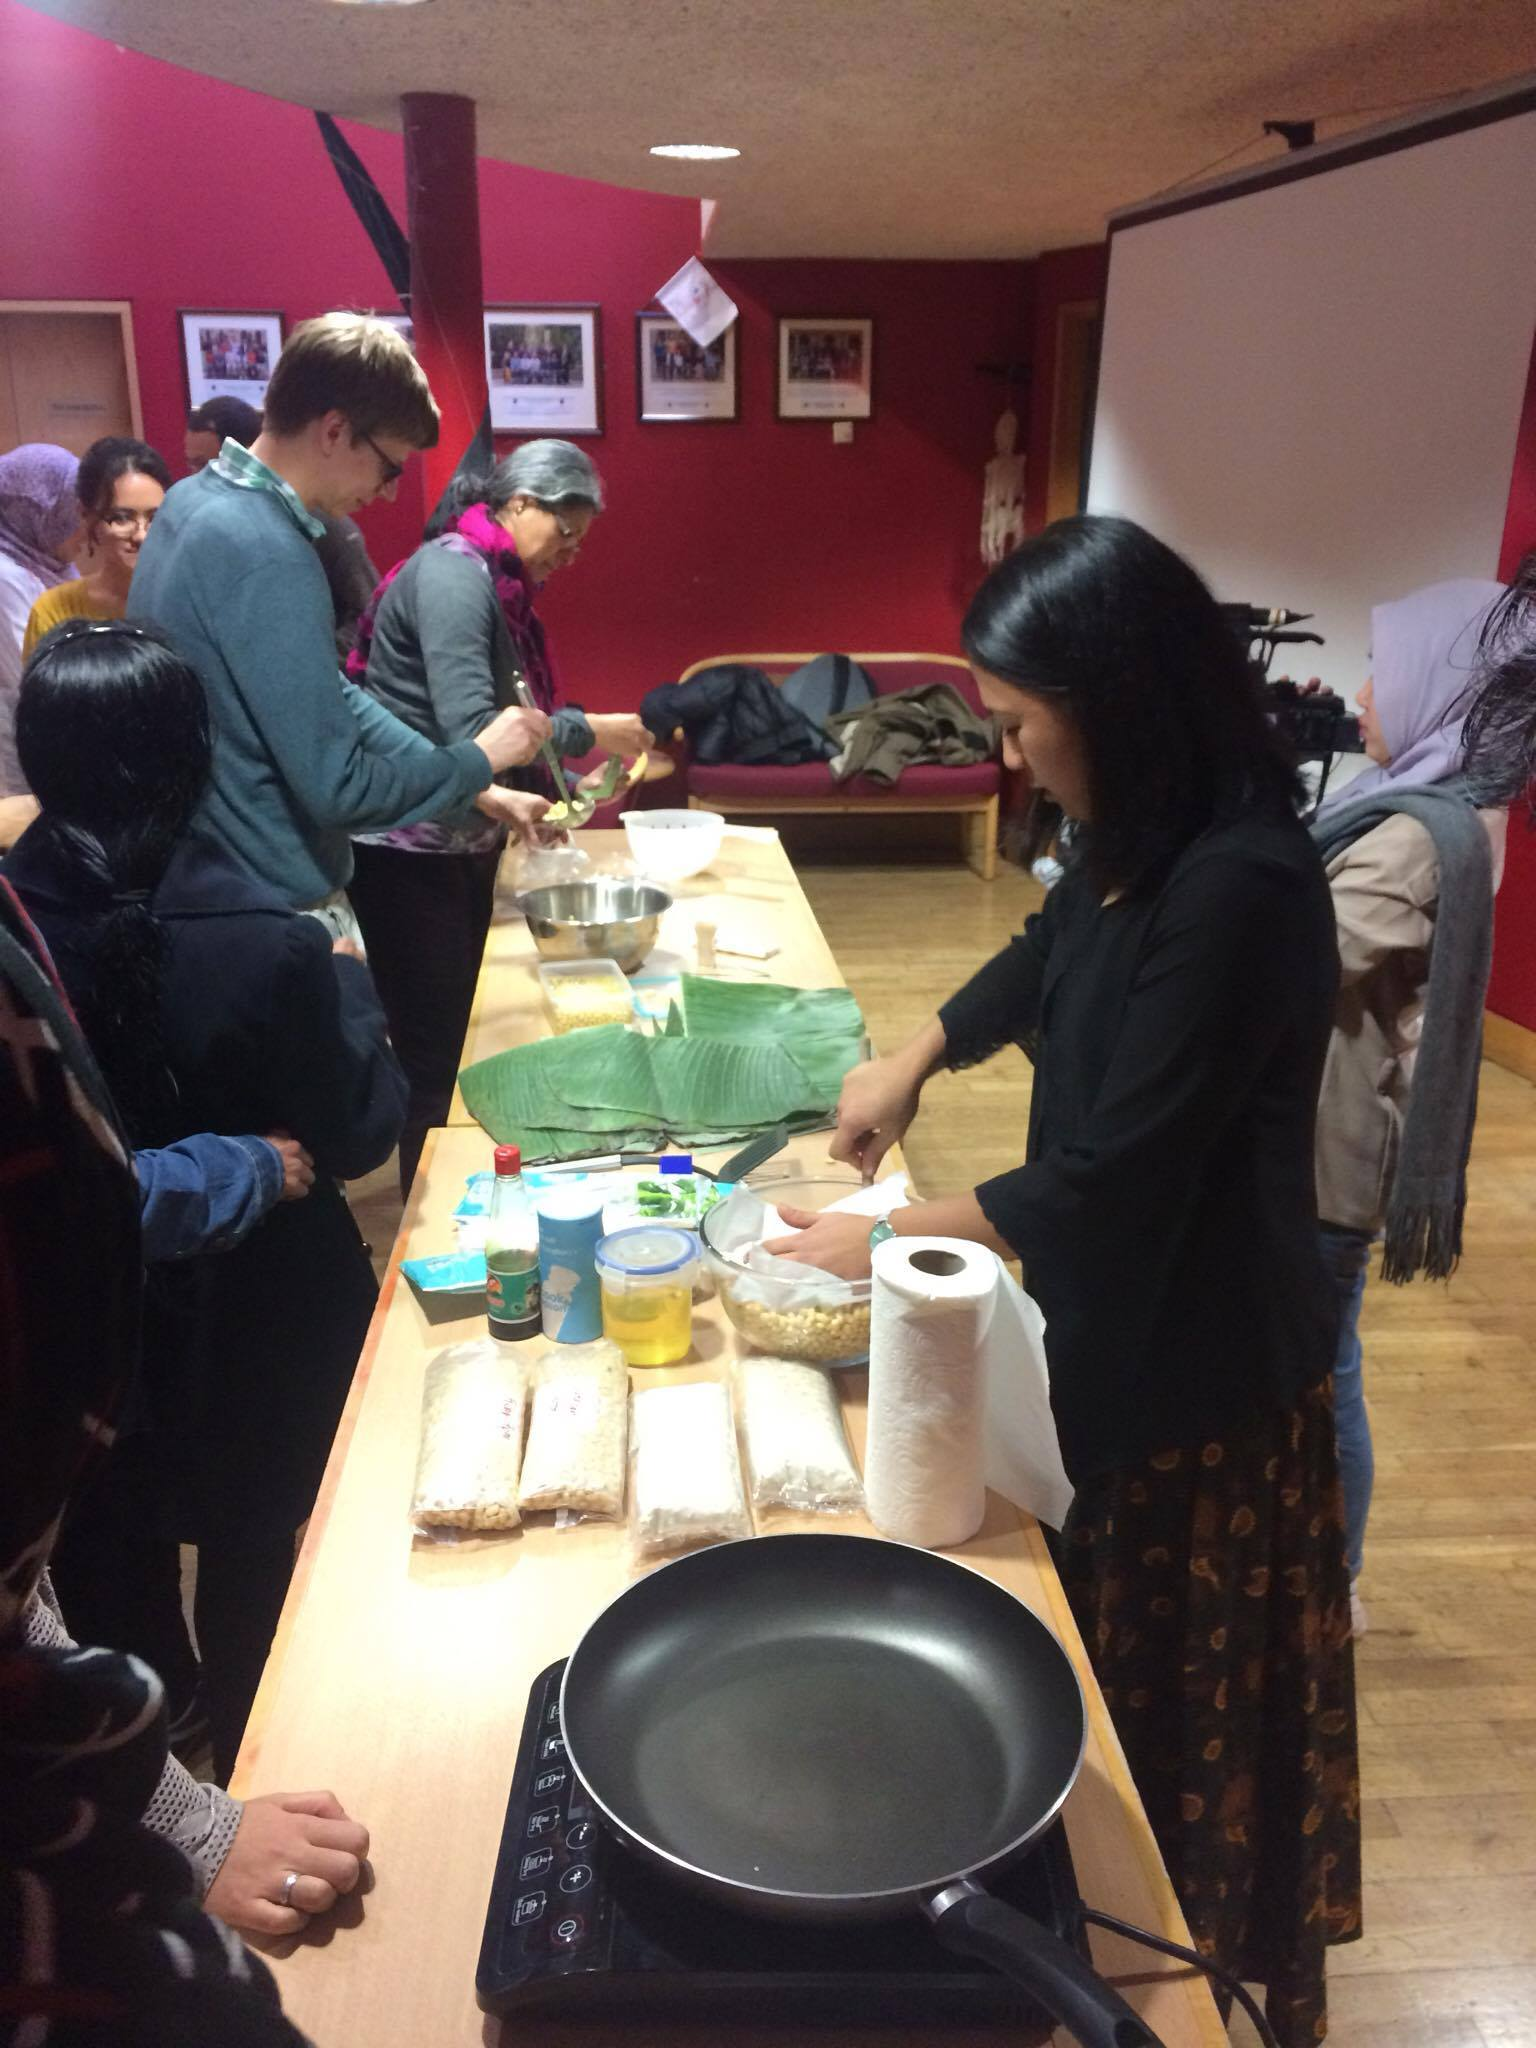 Tempe-making workshop at University of Oxford. image: PPI Oxford